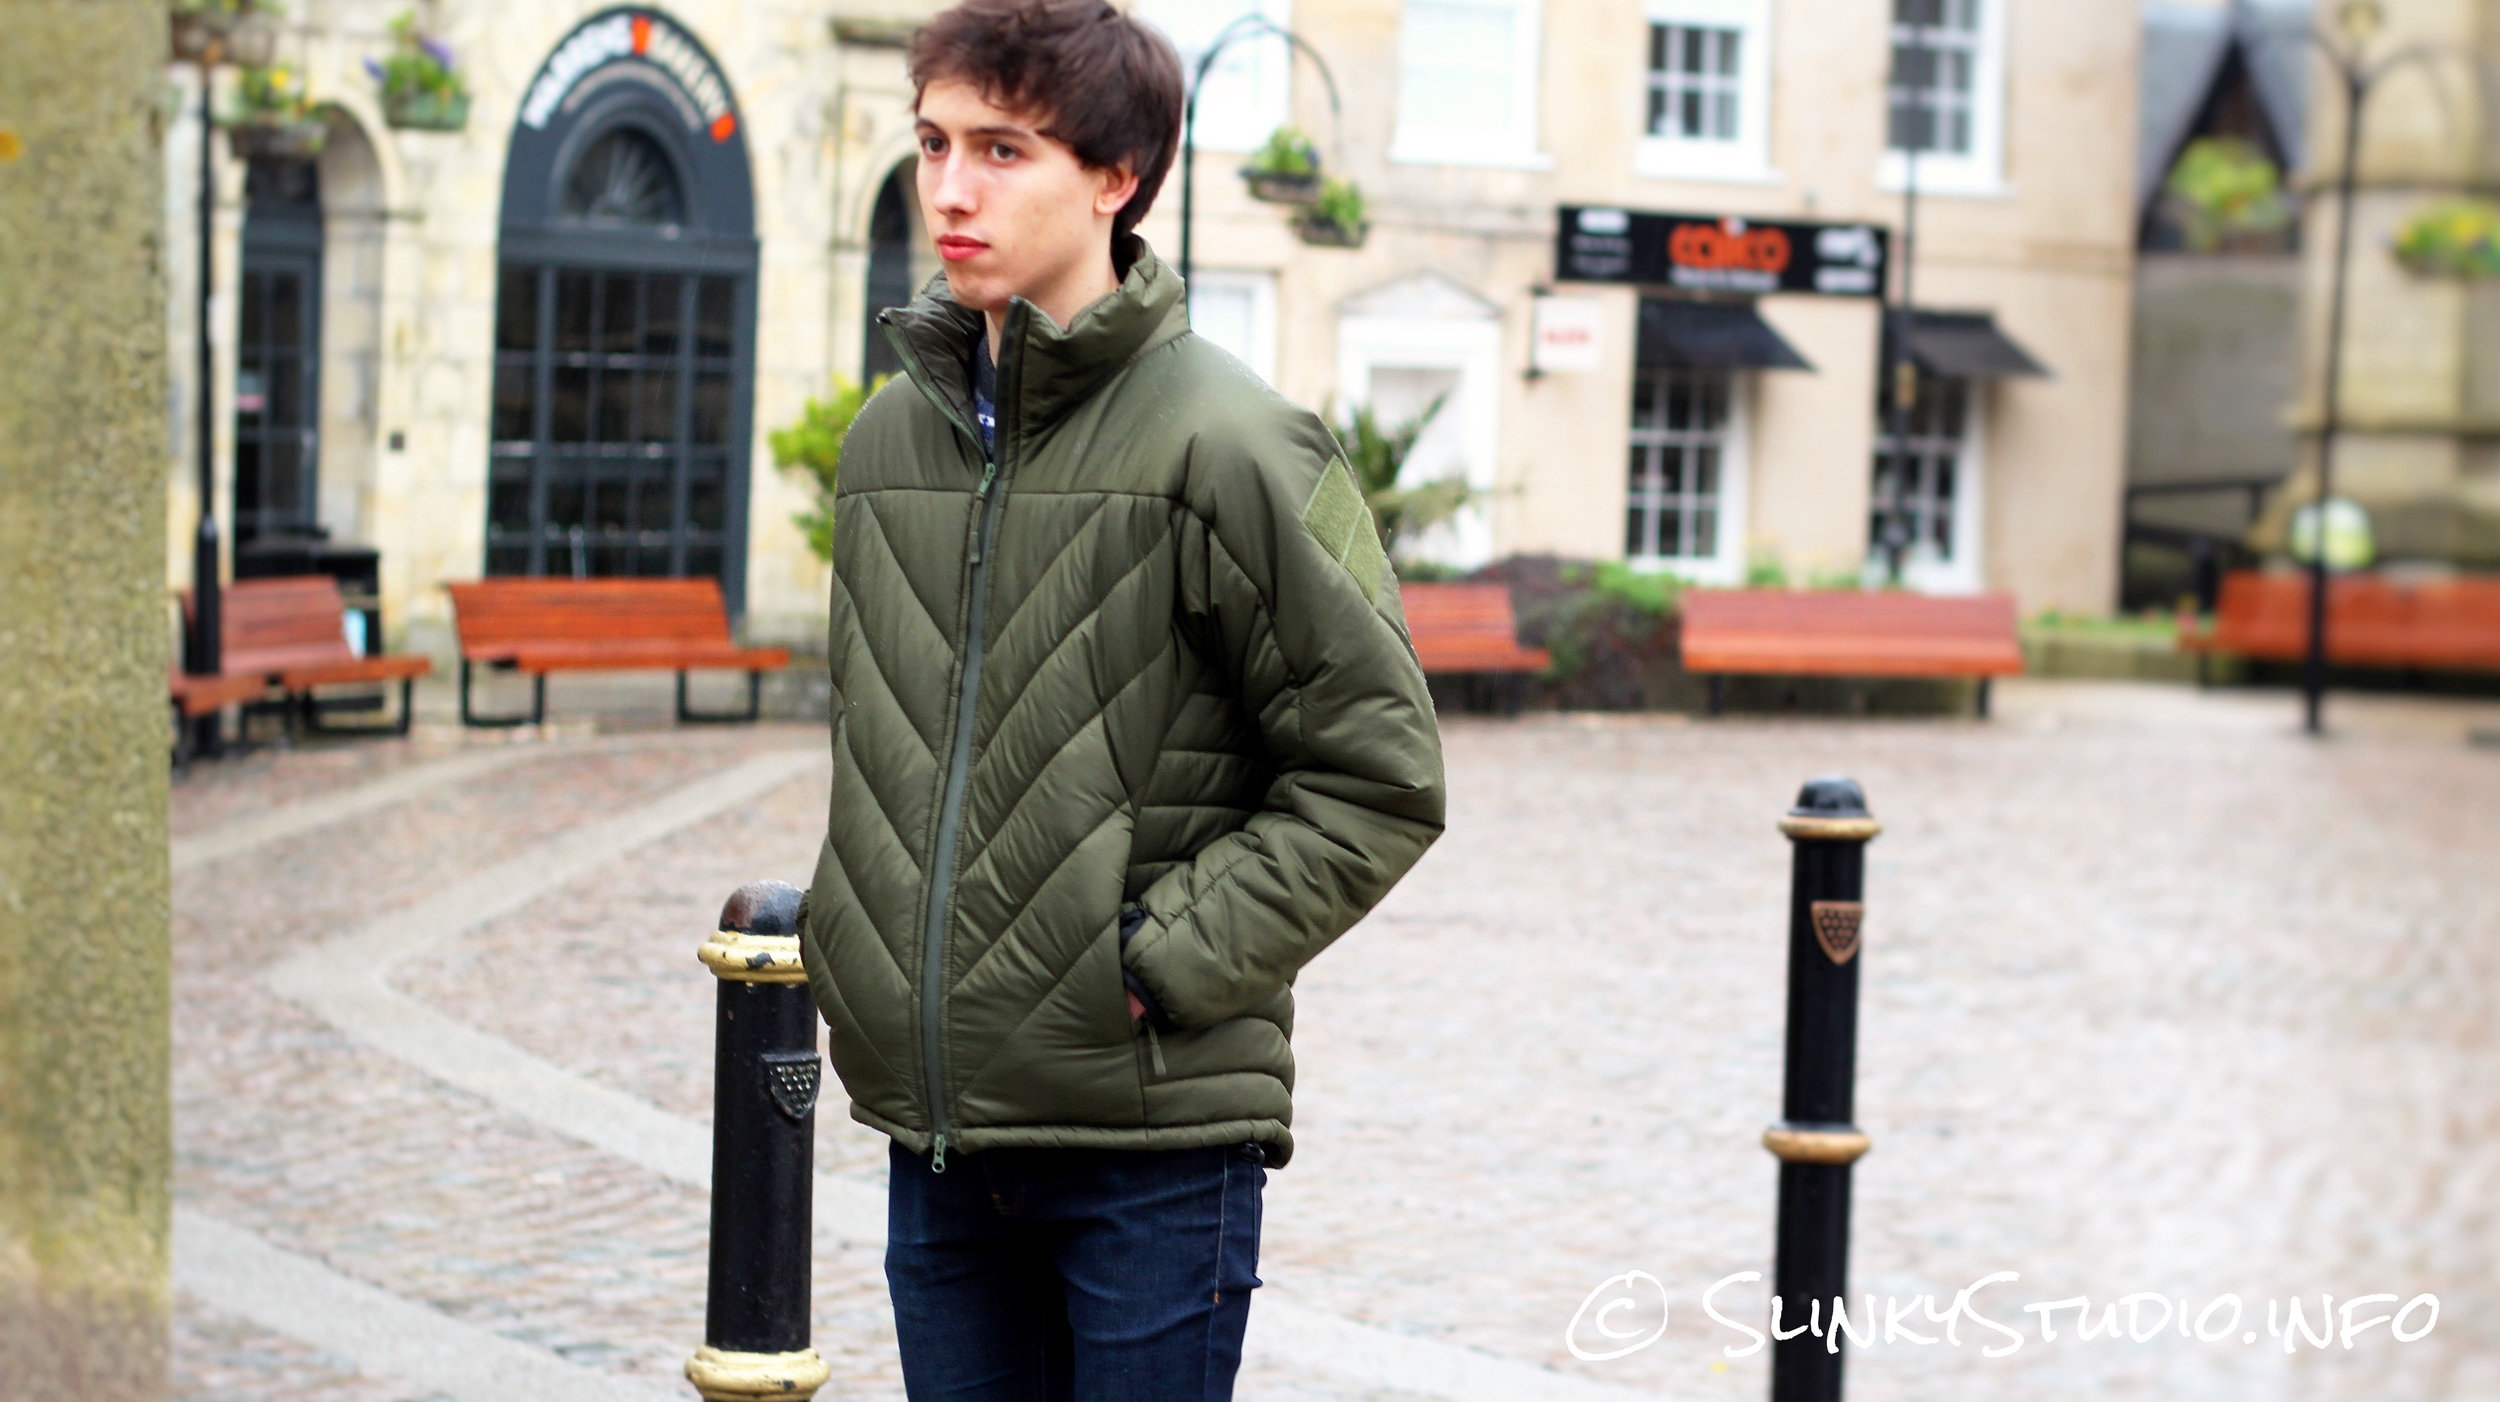 Snugpak SJ6 Jacket Hands in Pockets Truro Cornwall Centre.jpg